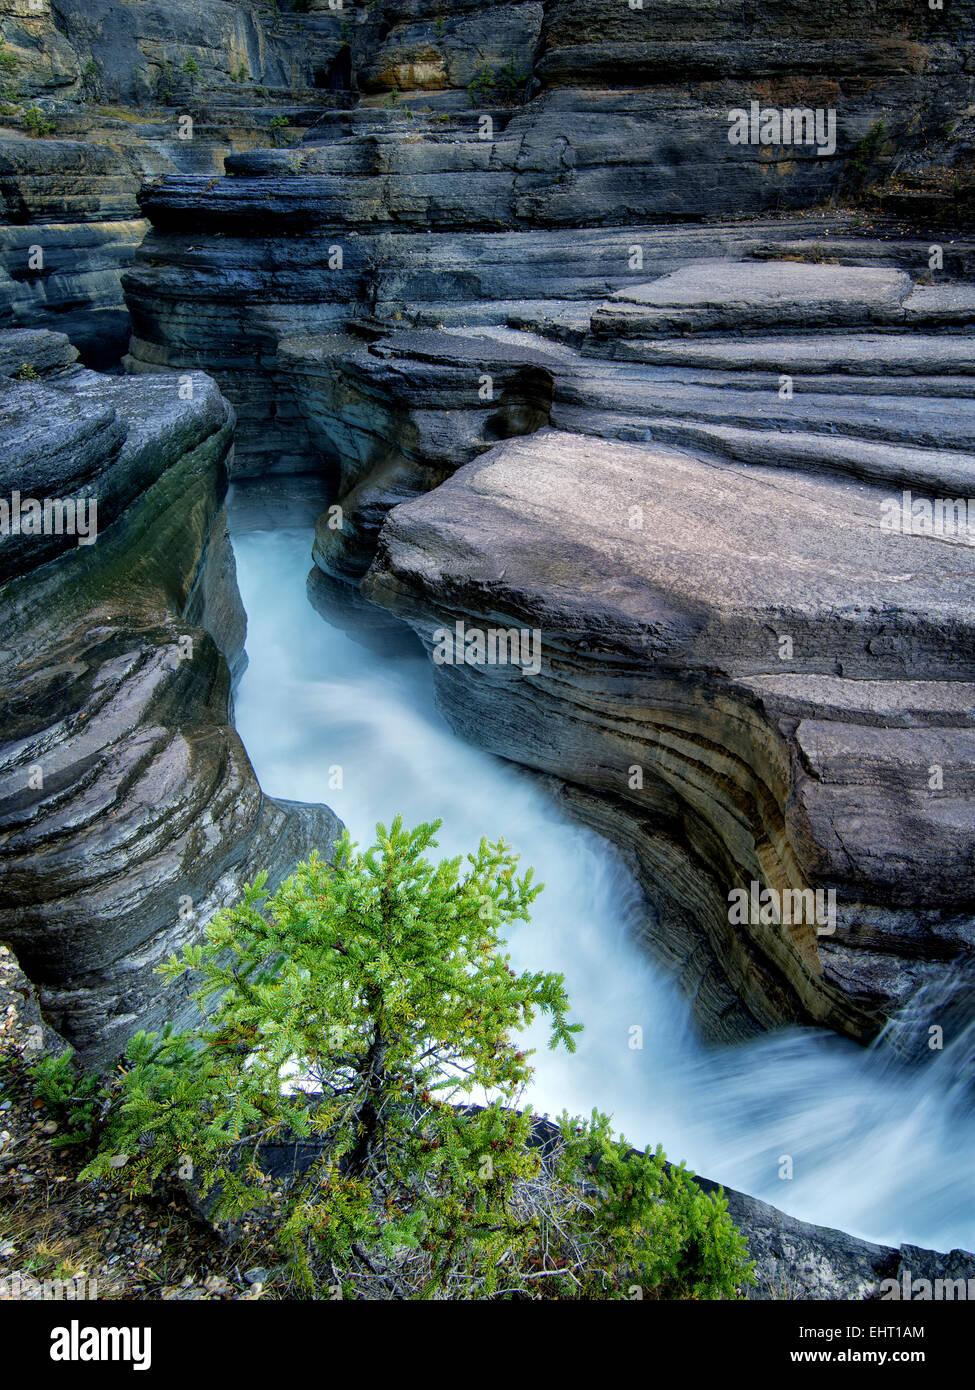 Stream in Mystiya Canyon. Banff National Park, Alberta, Canada - Stock Image